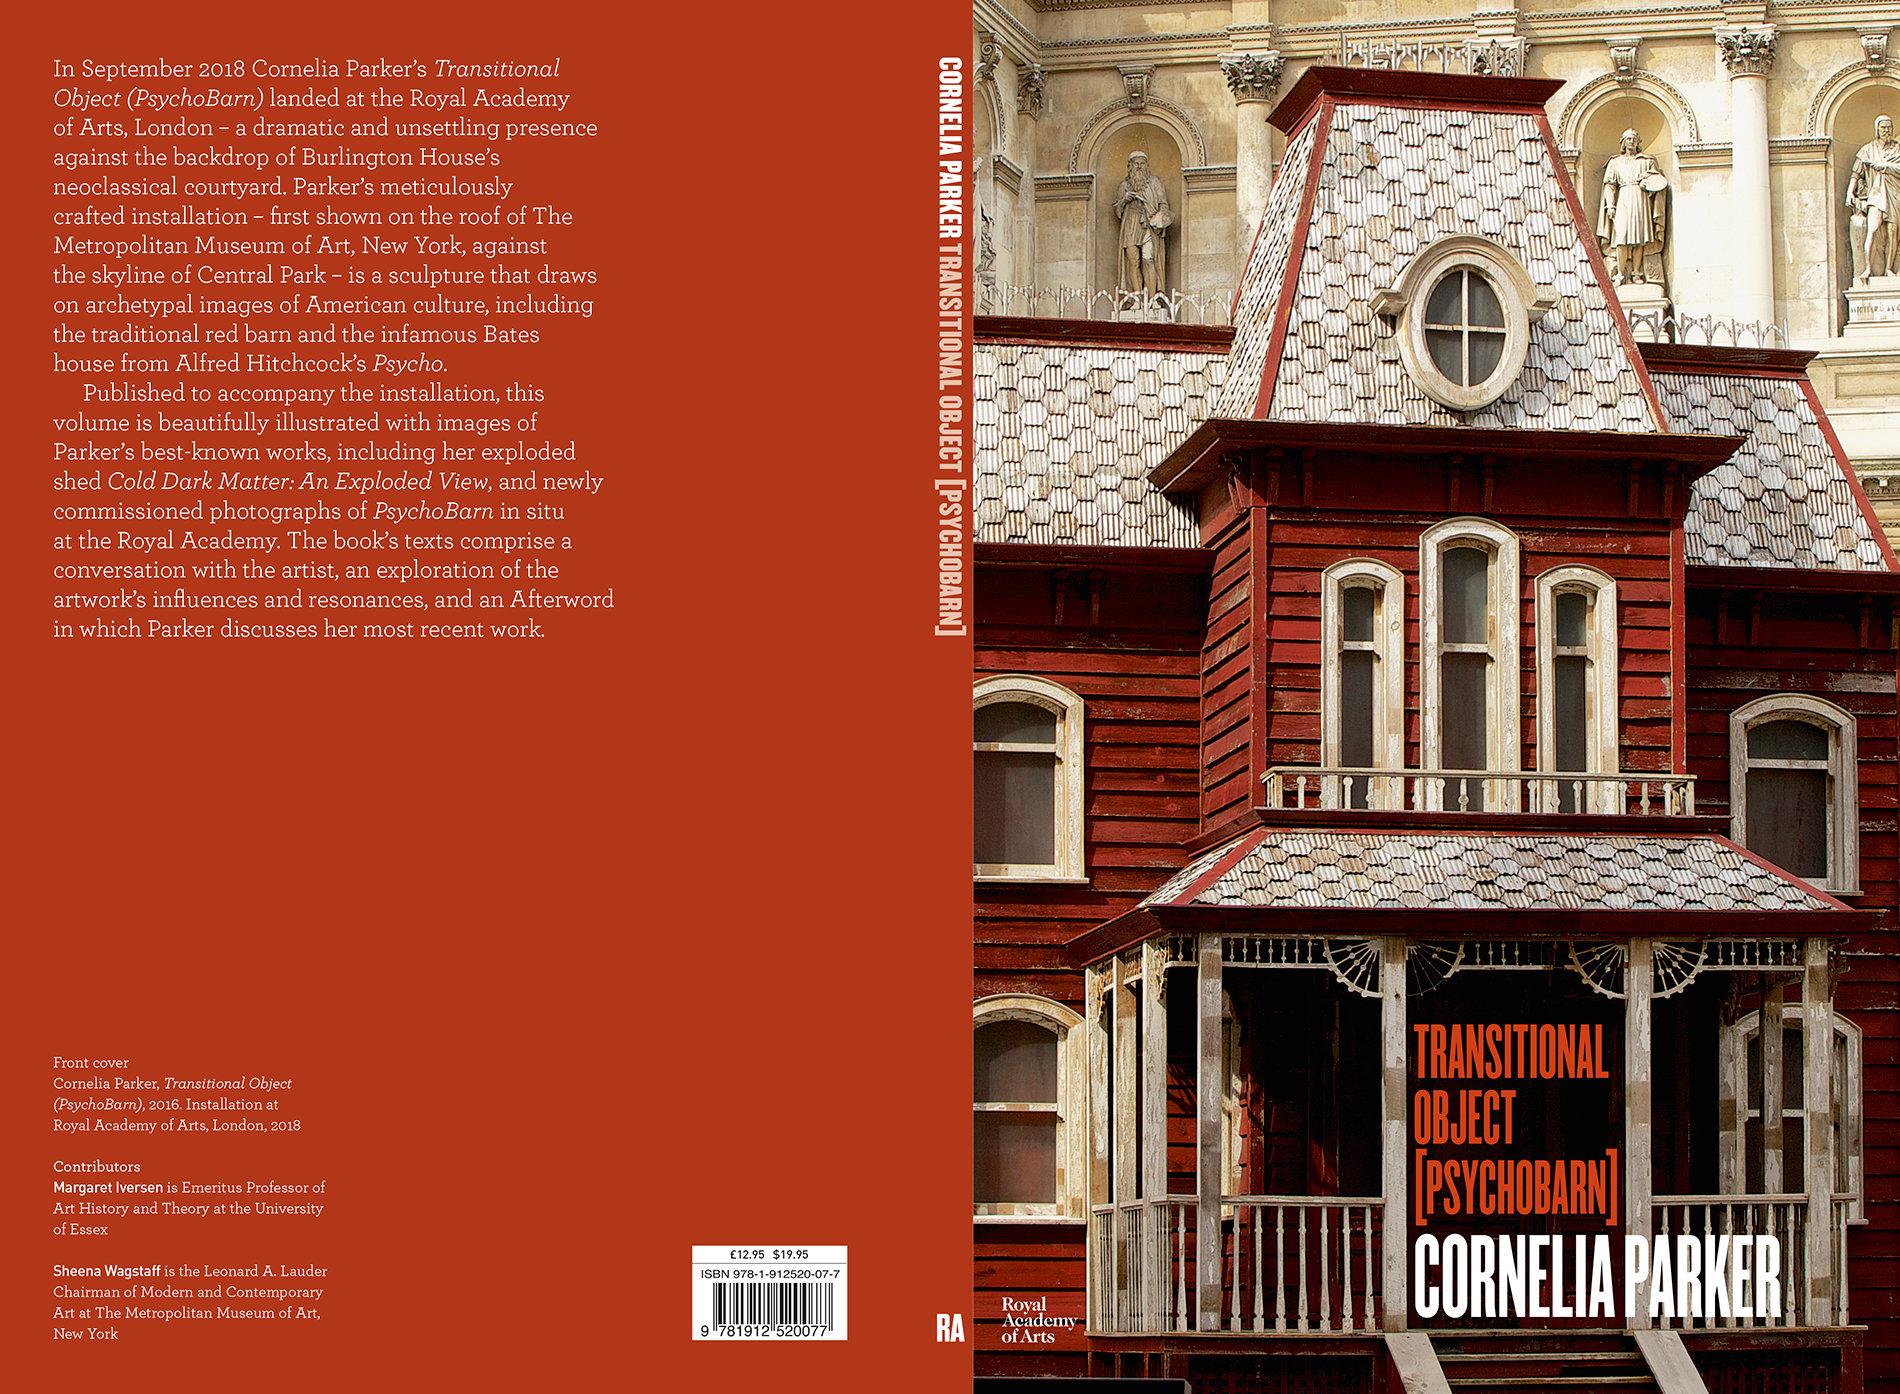 Cornelia Parker - Transitional object (Psychobarn)